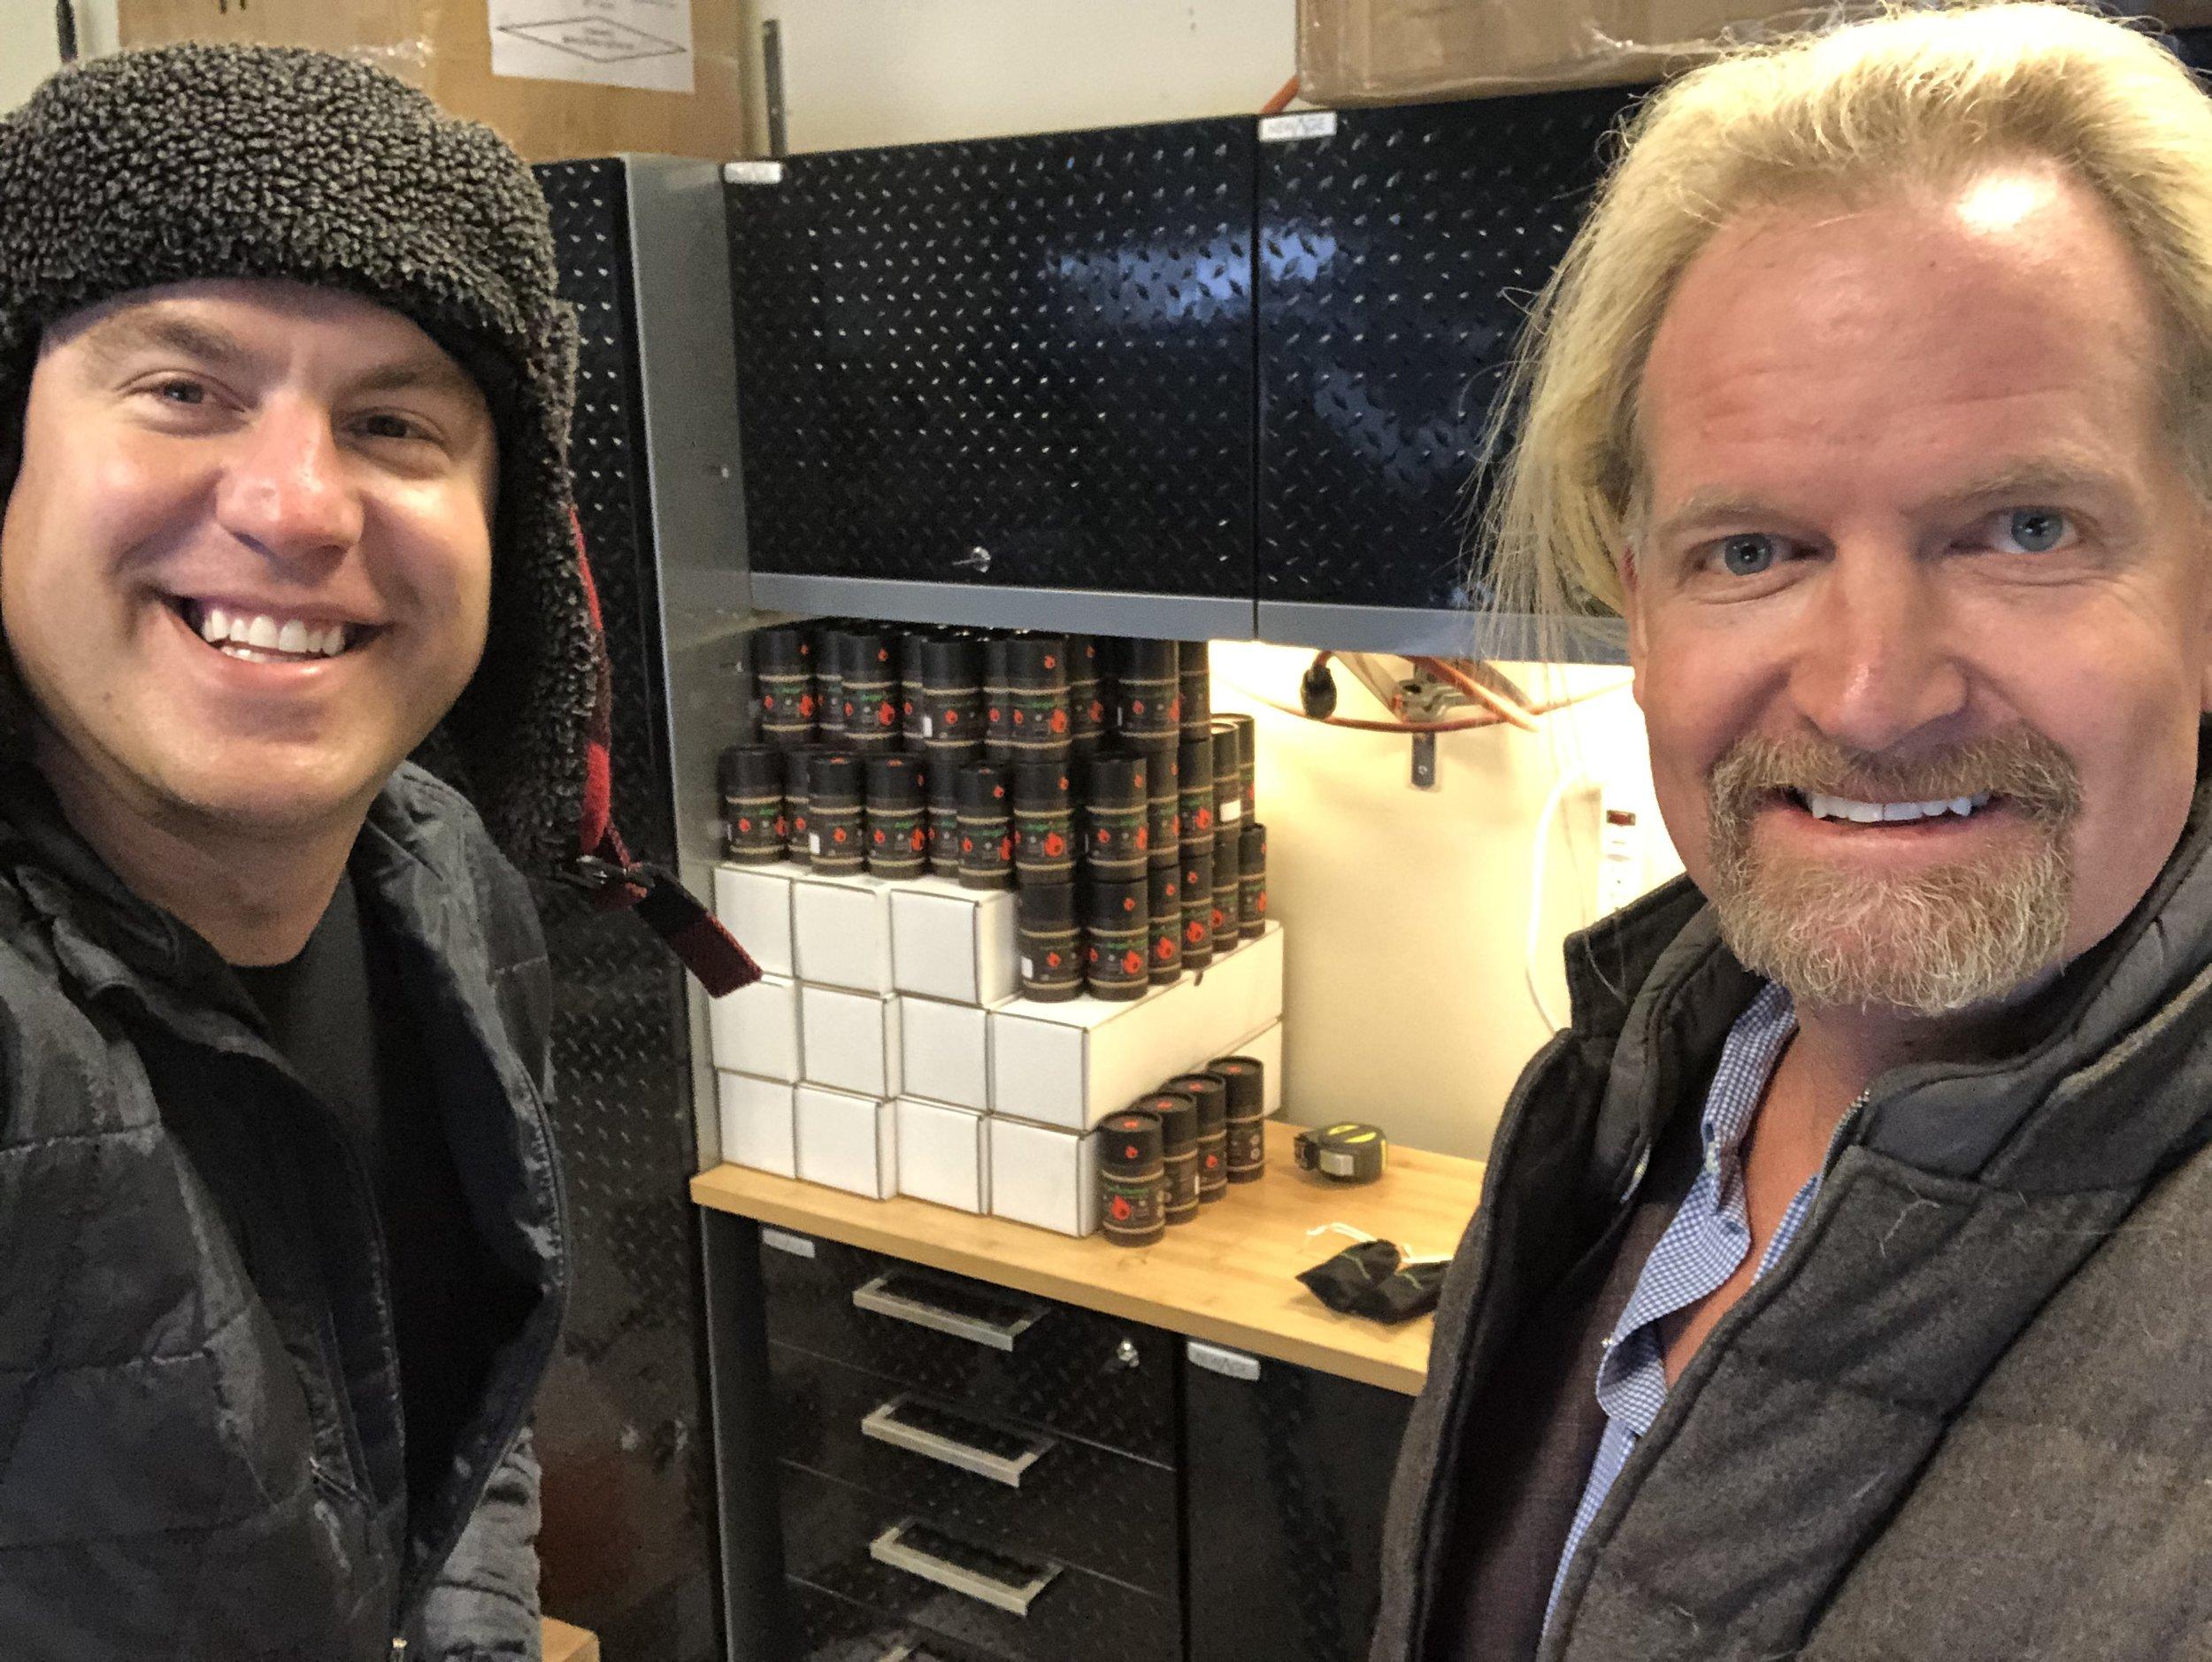 Founders of CBD Hemp Oil Company: AngelsHemp.com